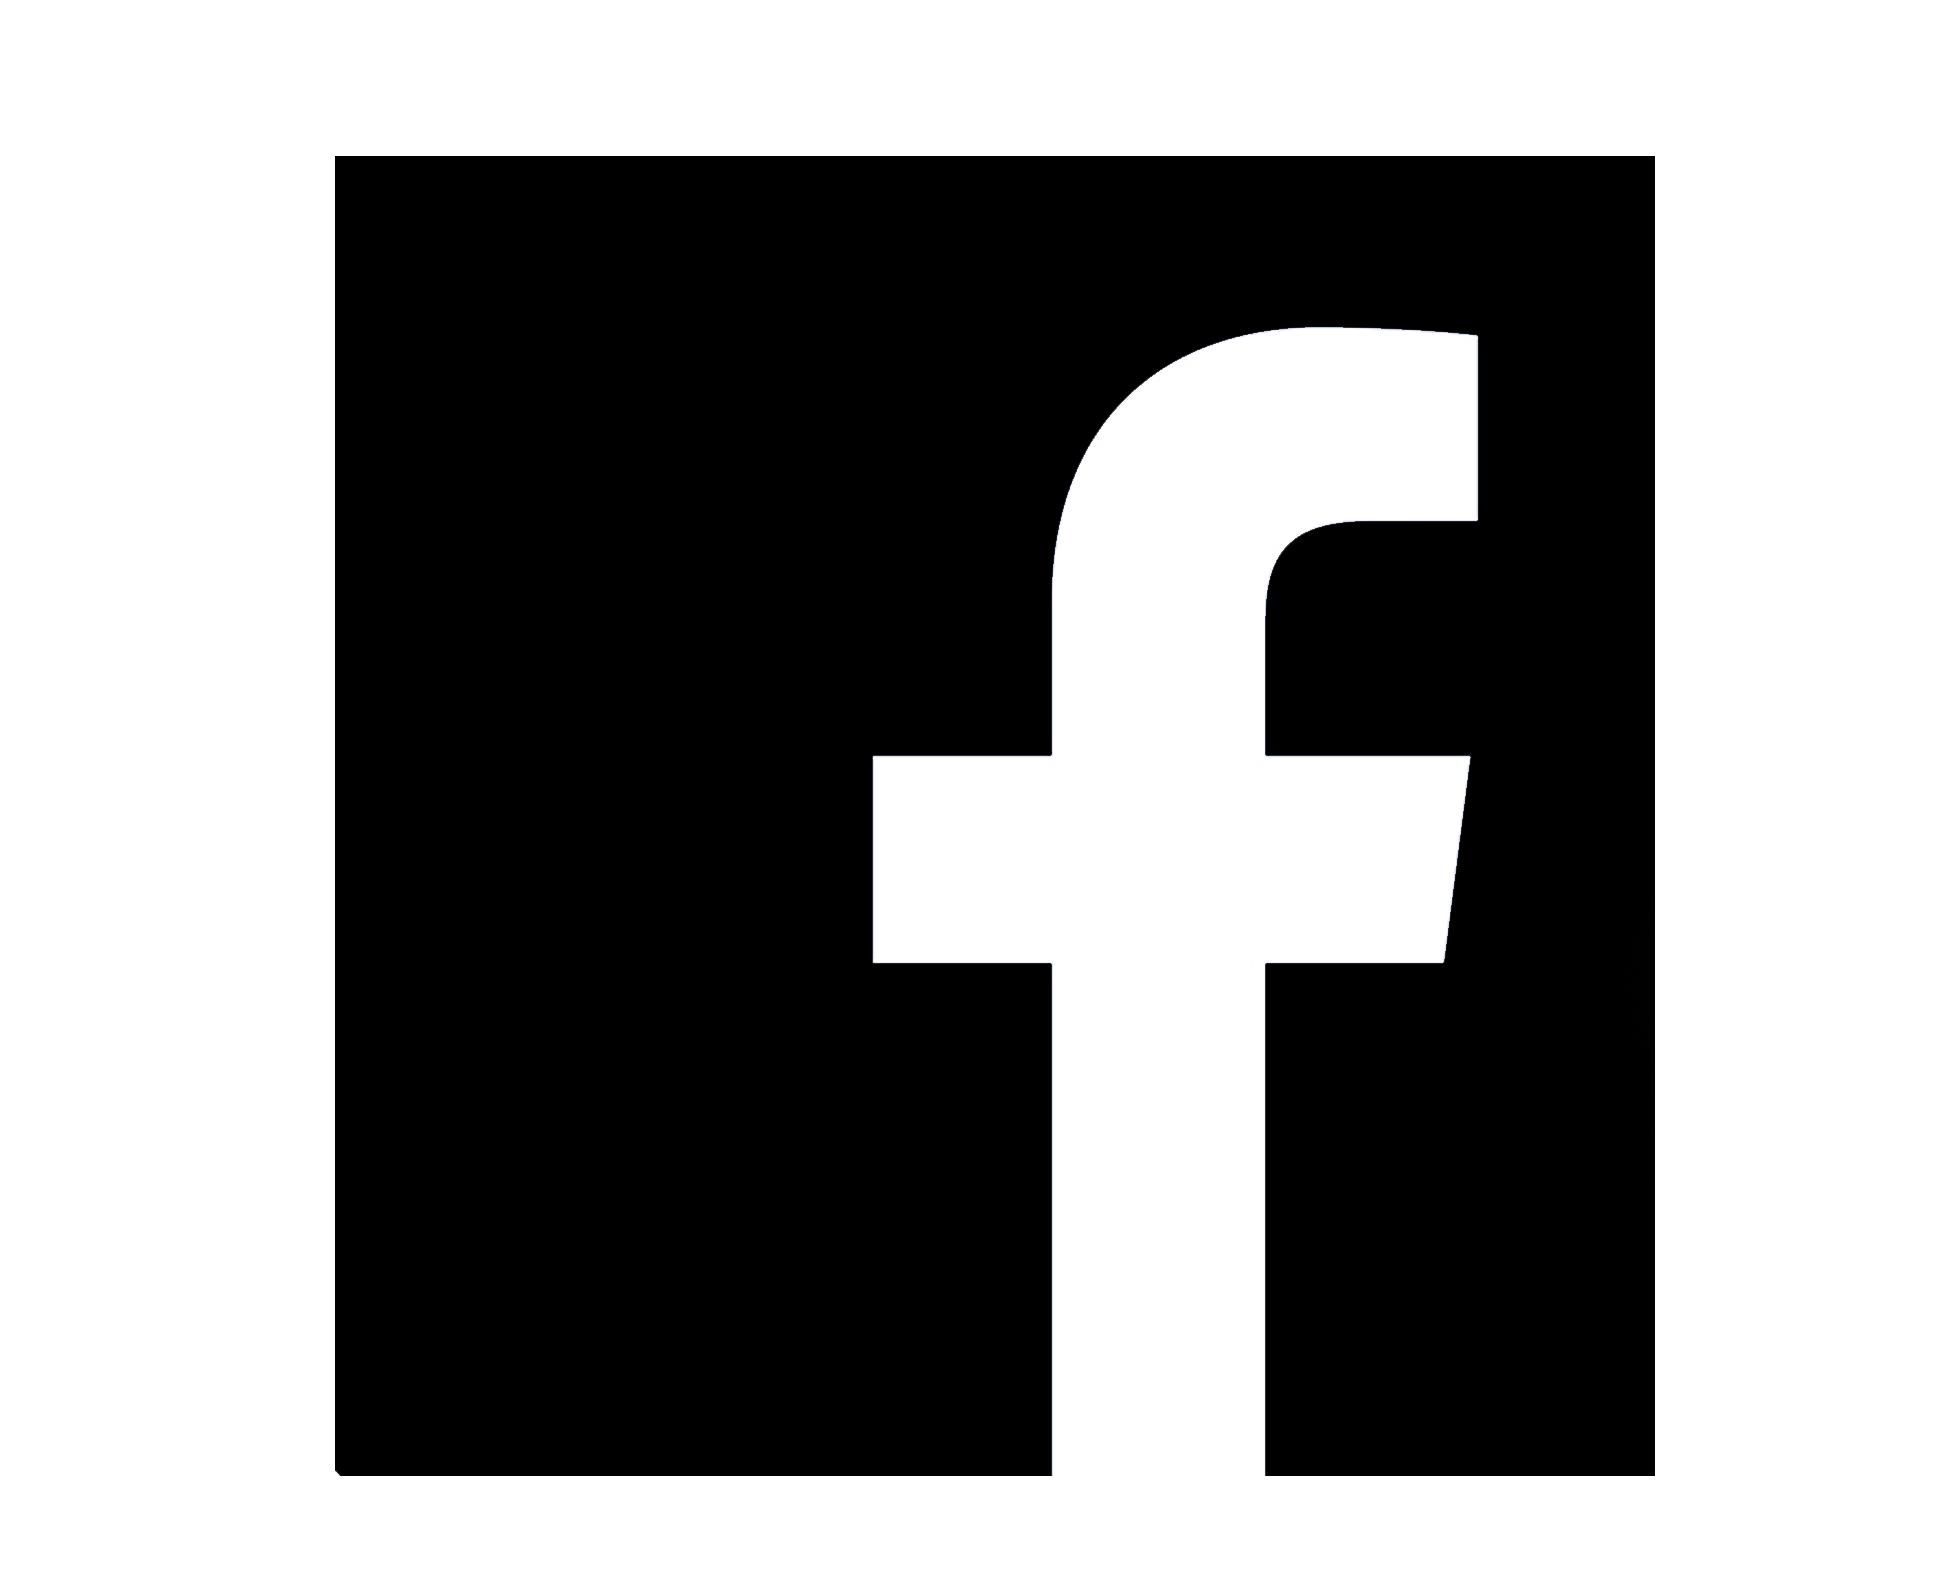 Facebook-logo - neezostudios.com